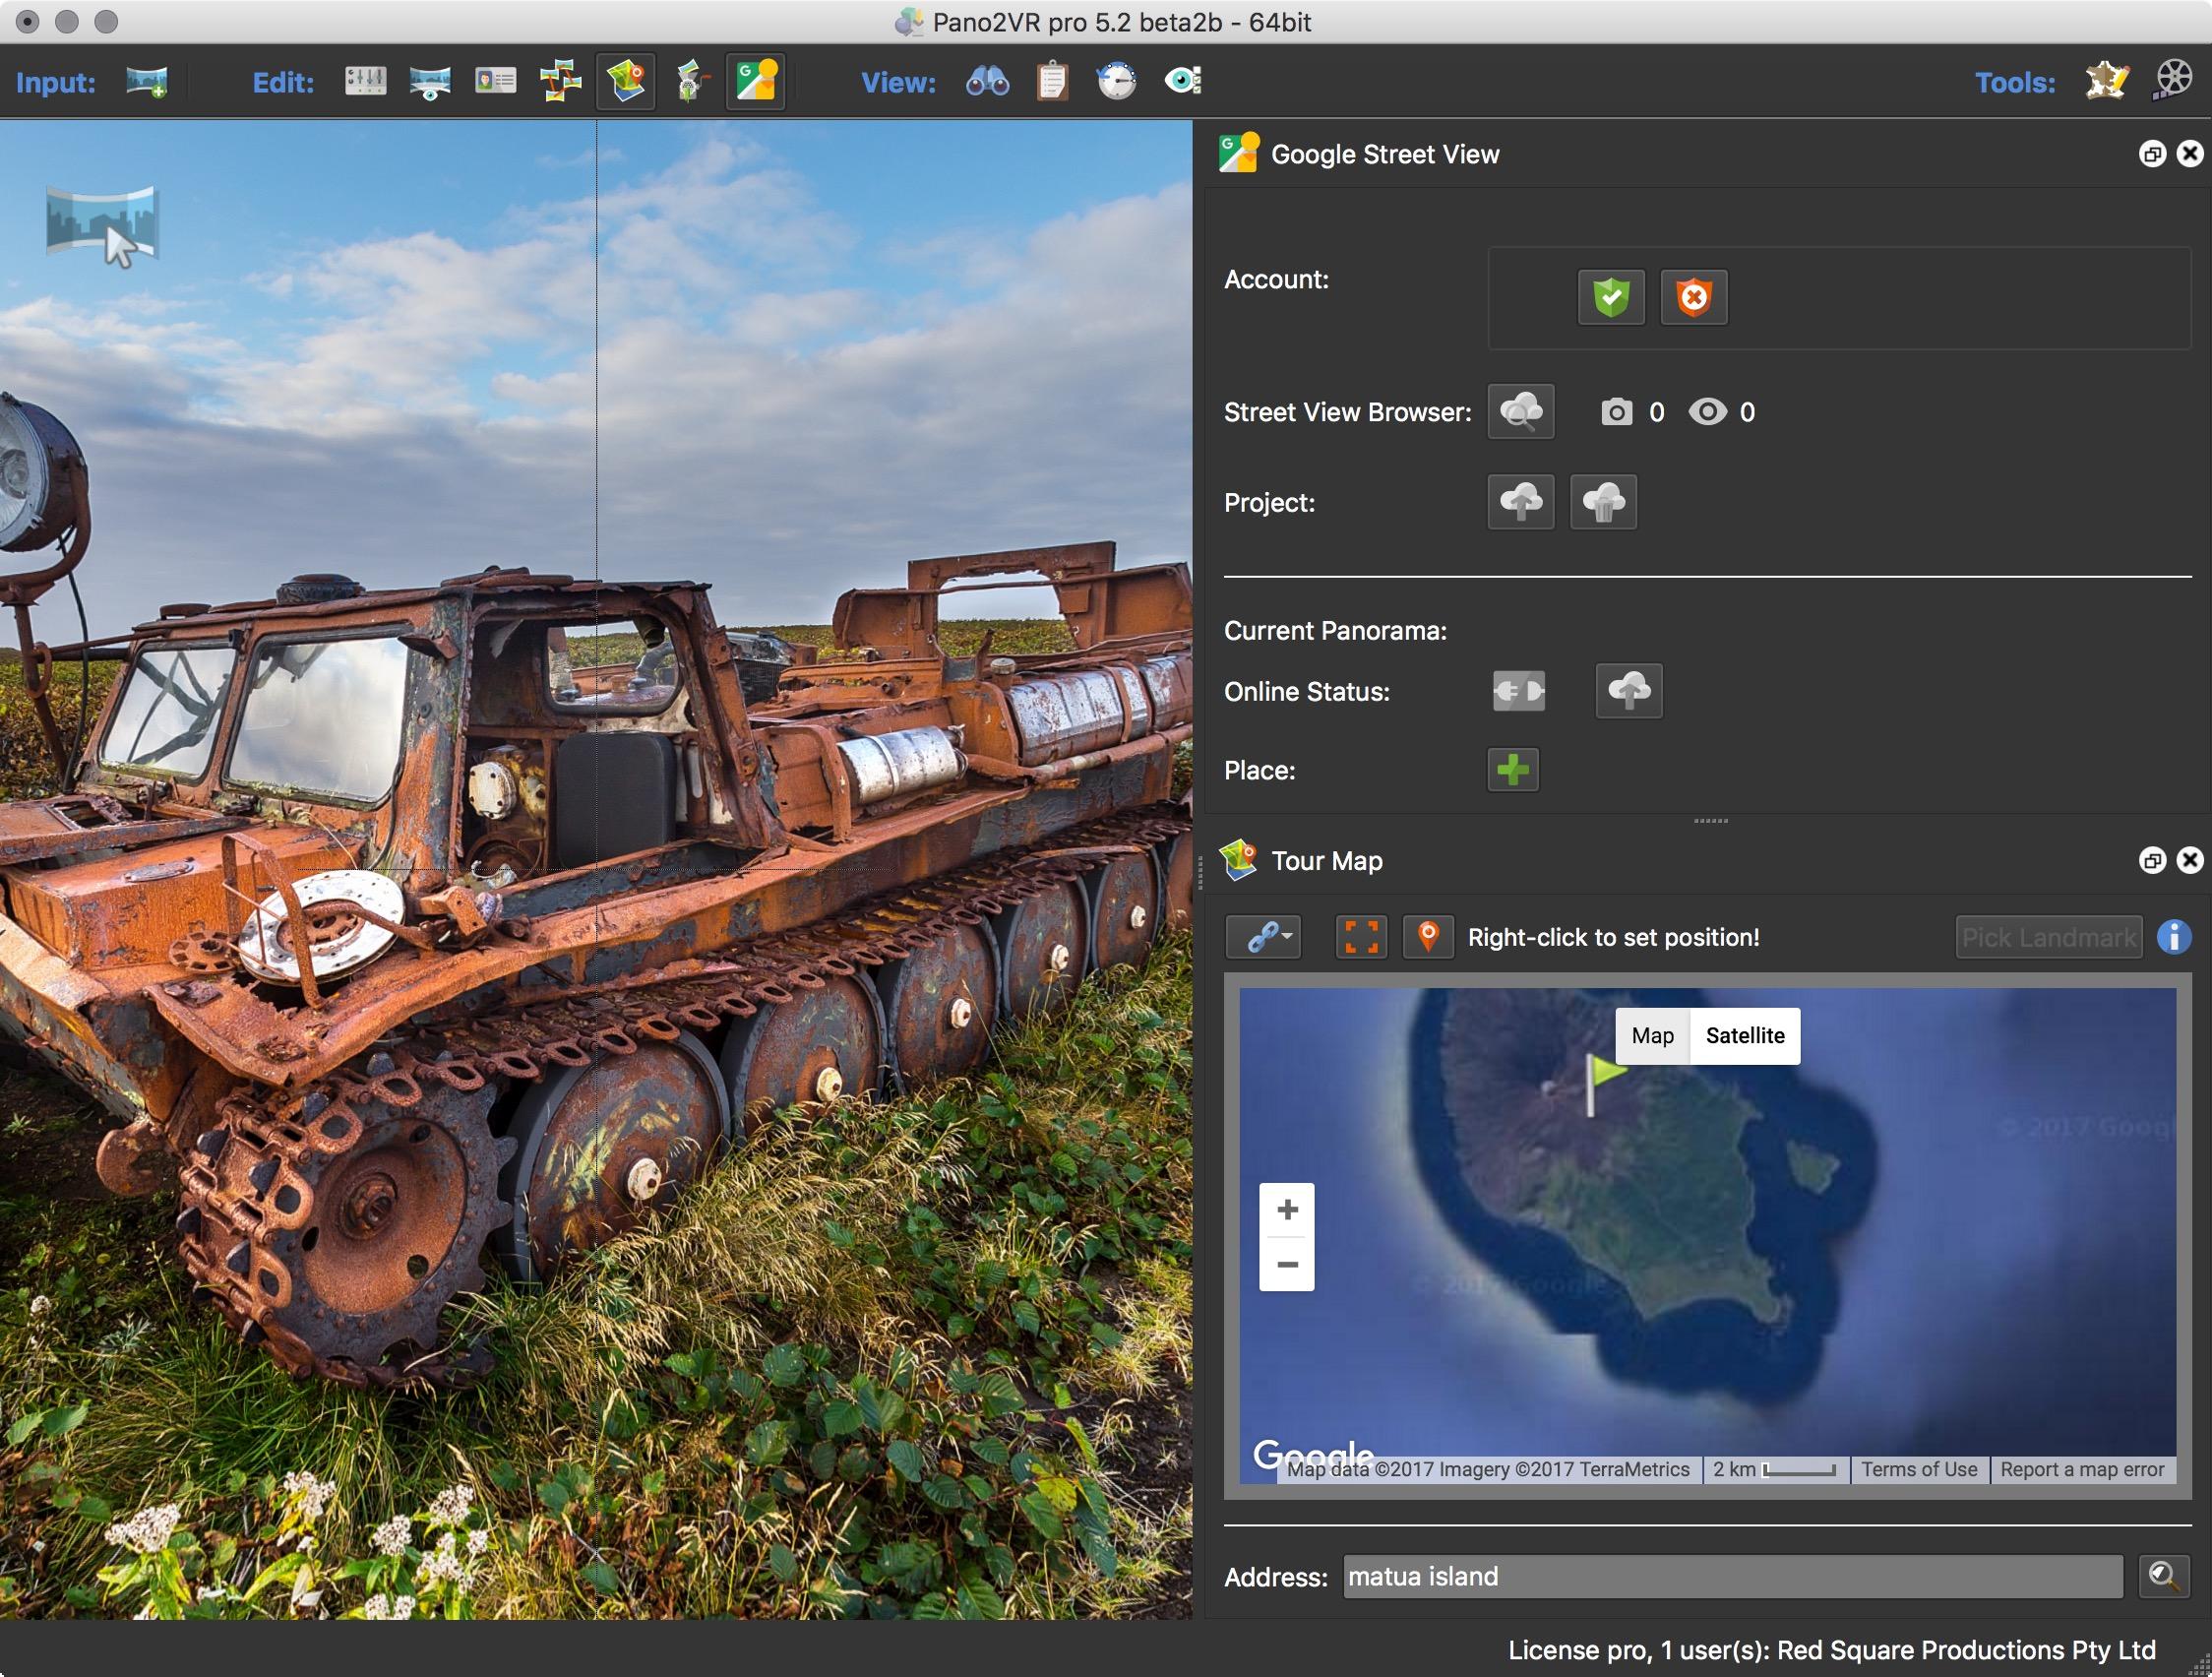 Pano2VR5.2beta2b Google Street View interface